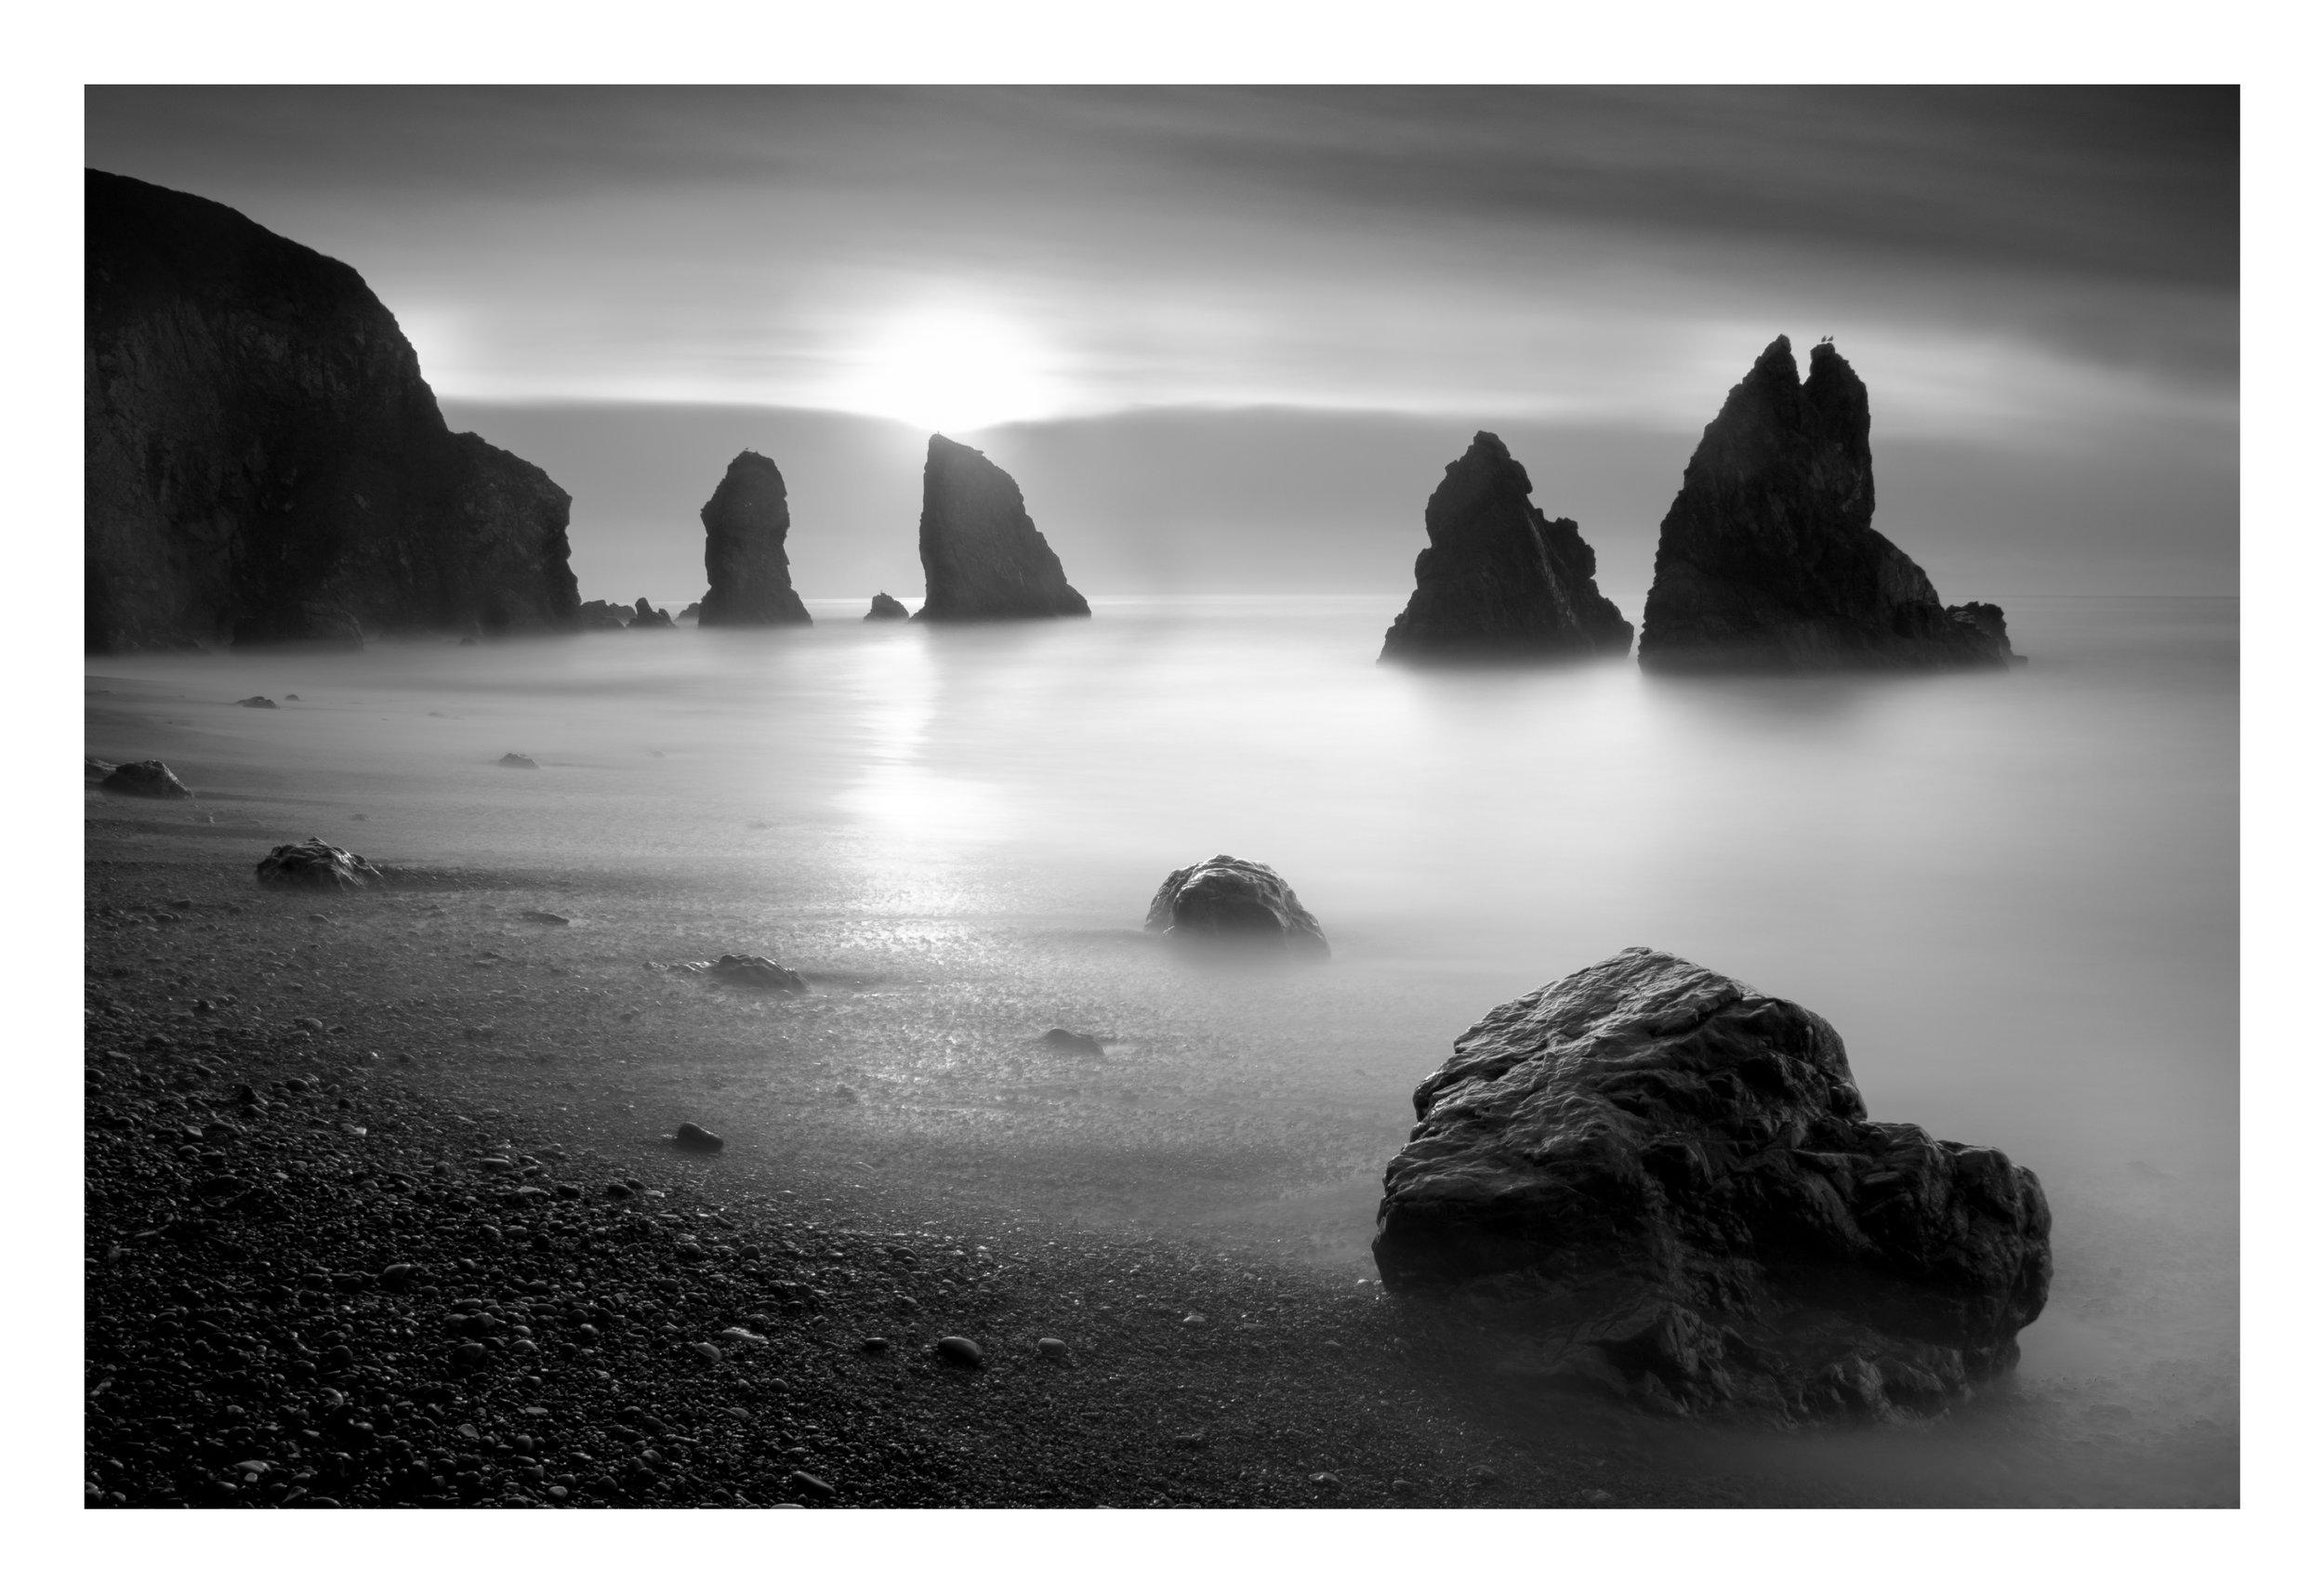 Image taken at dawn, unfortunately into the sun.